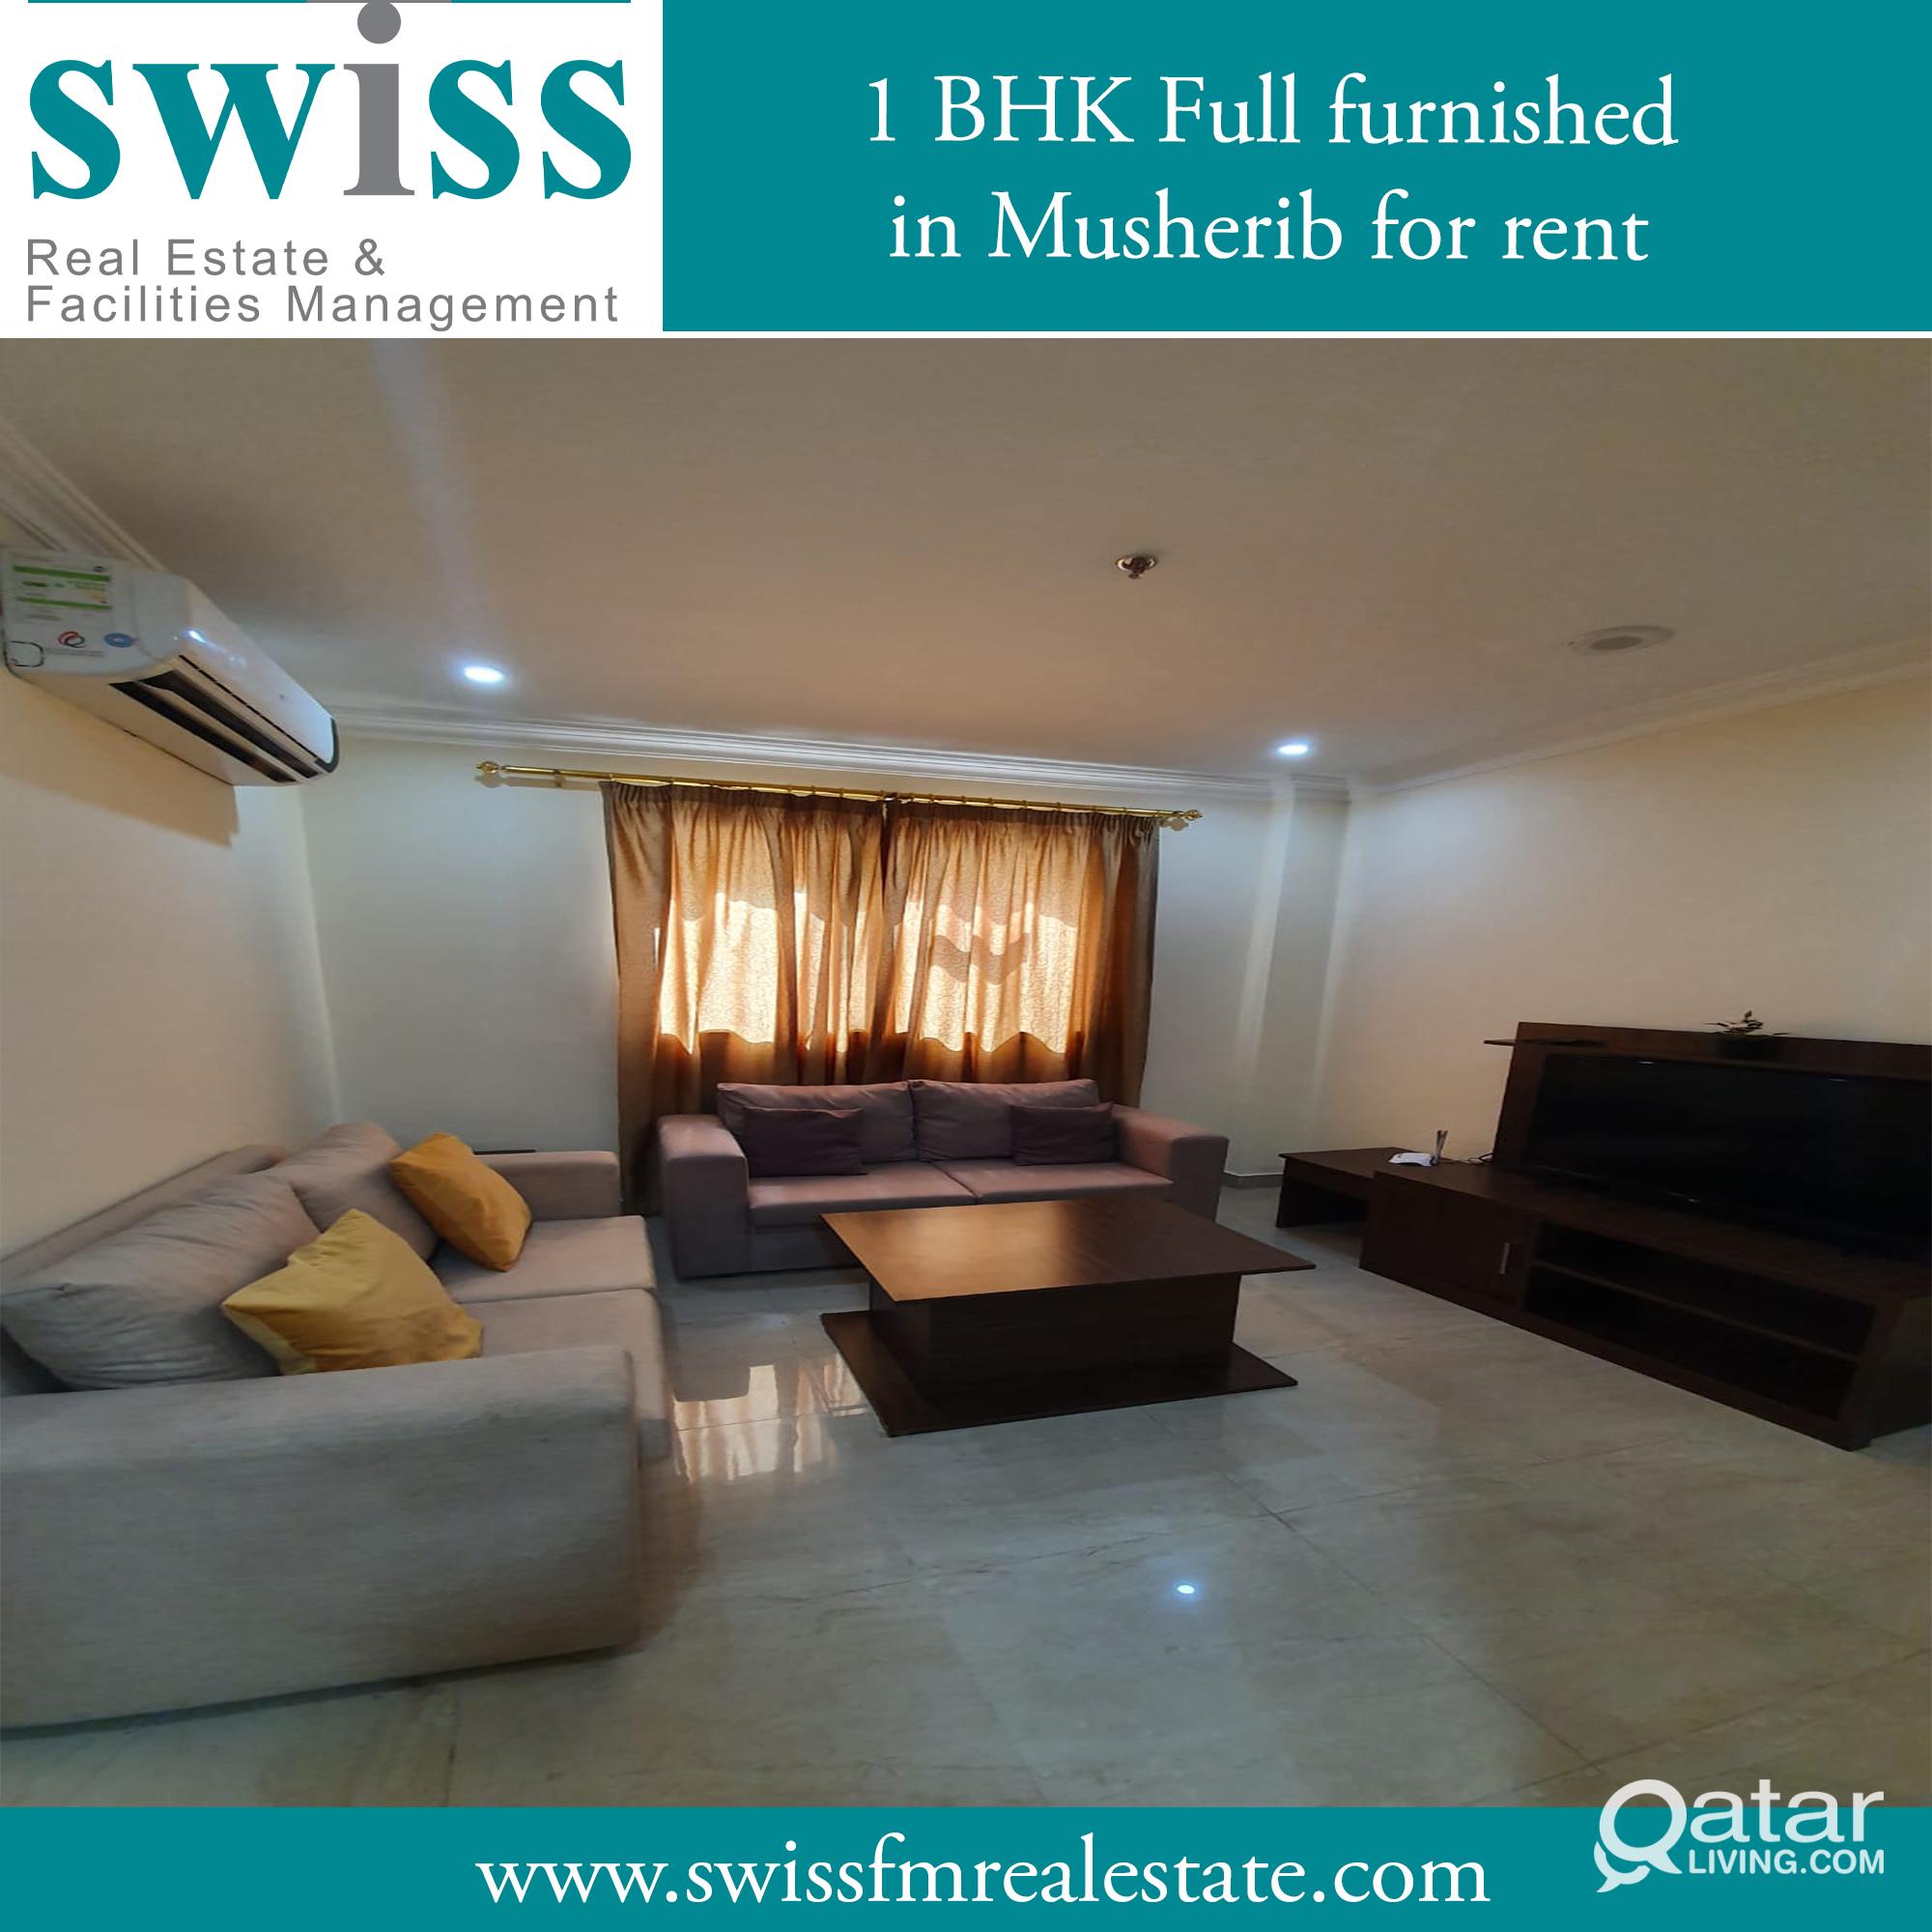 1 BHK apartment in Musheireb full furnished